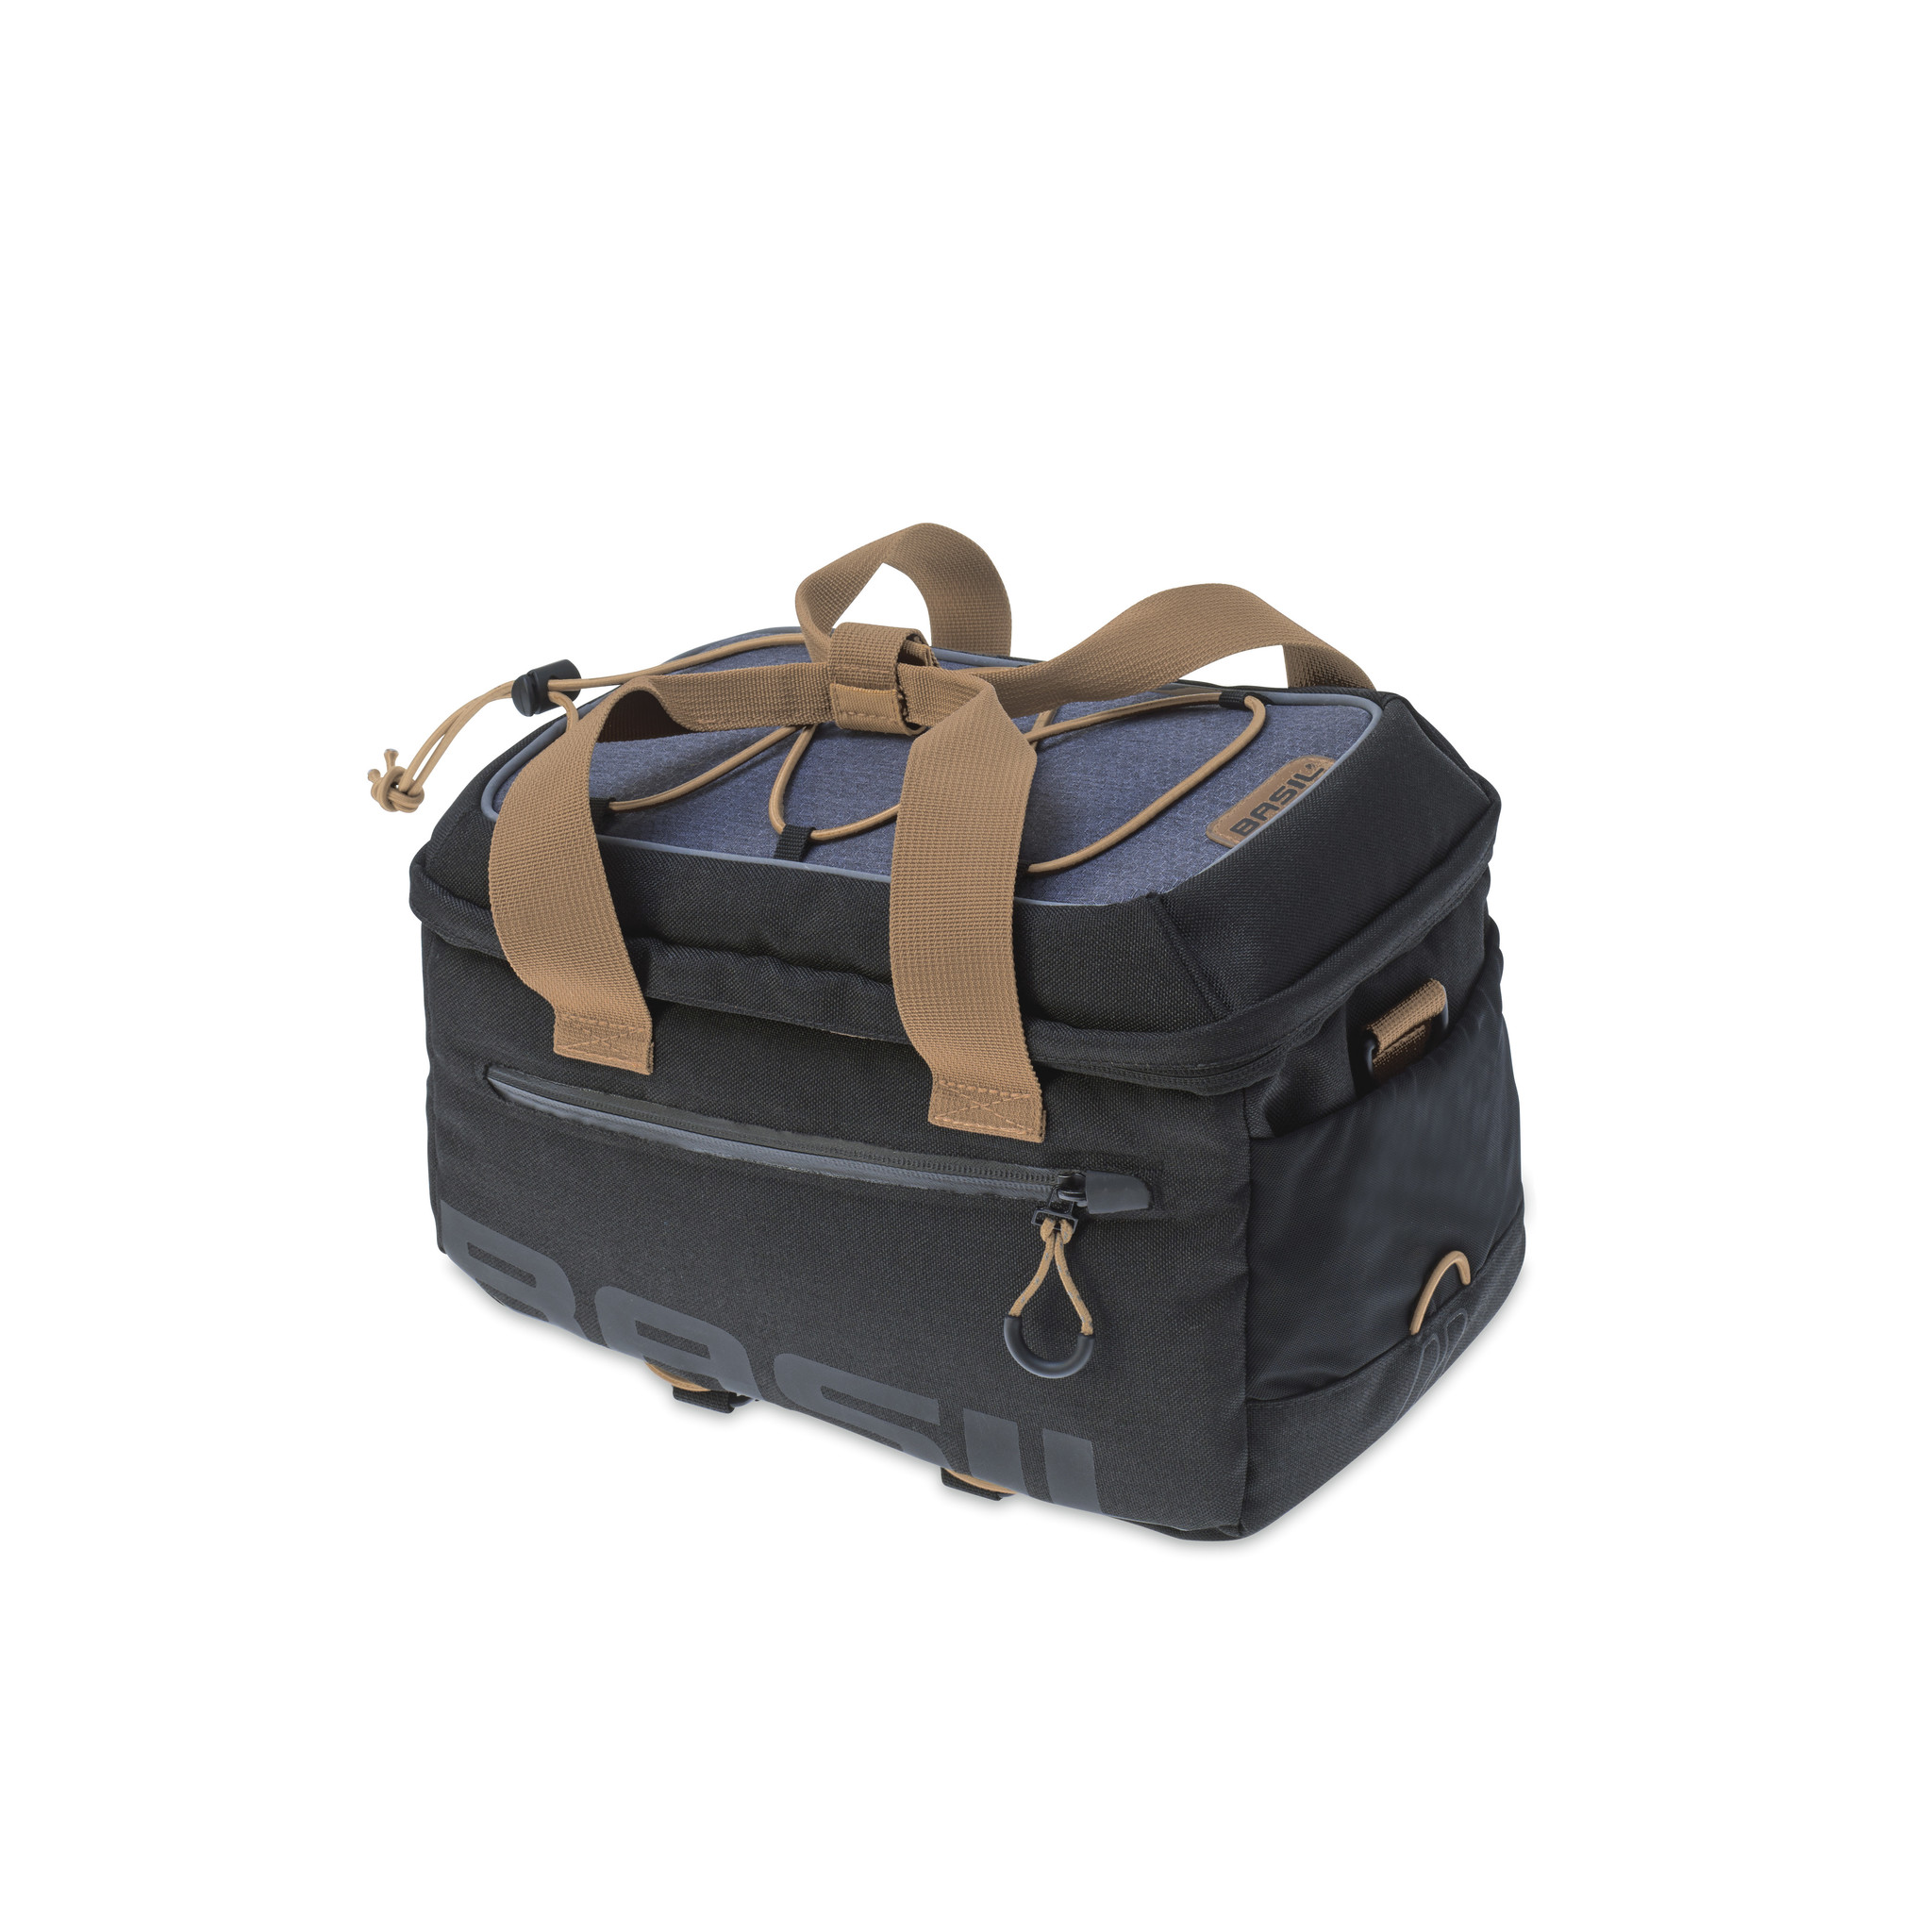 Sacoche pour porte bagage